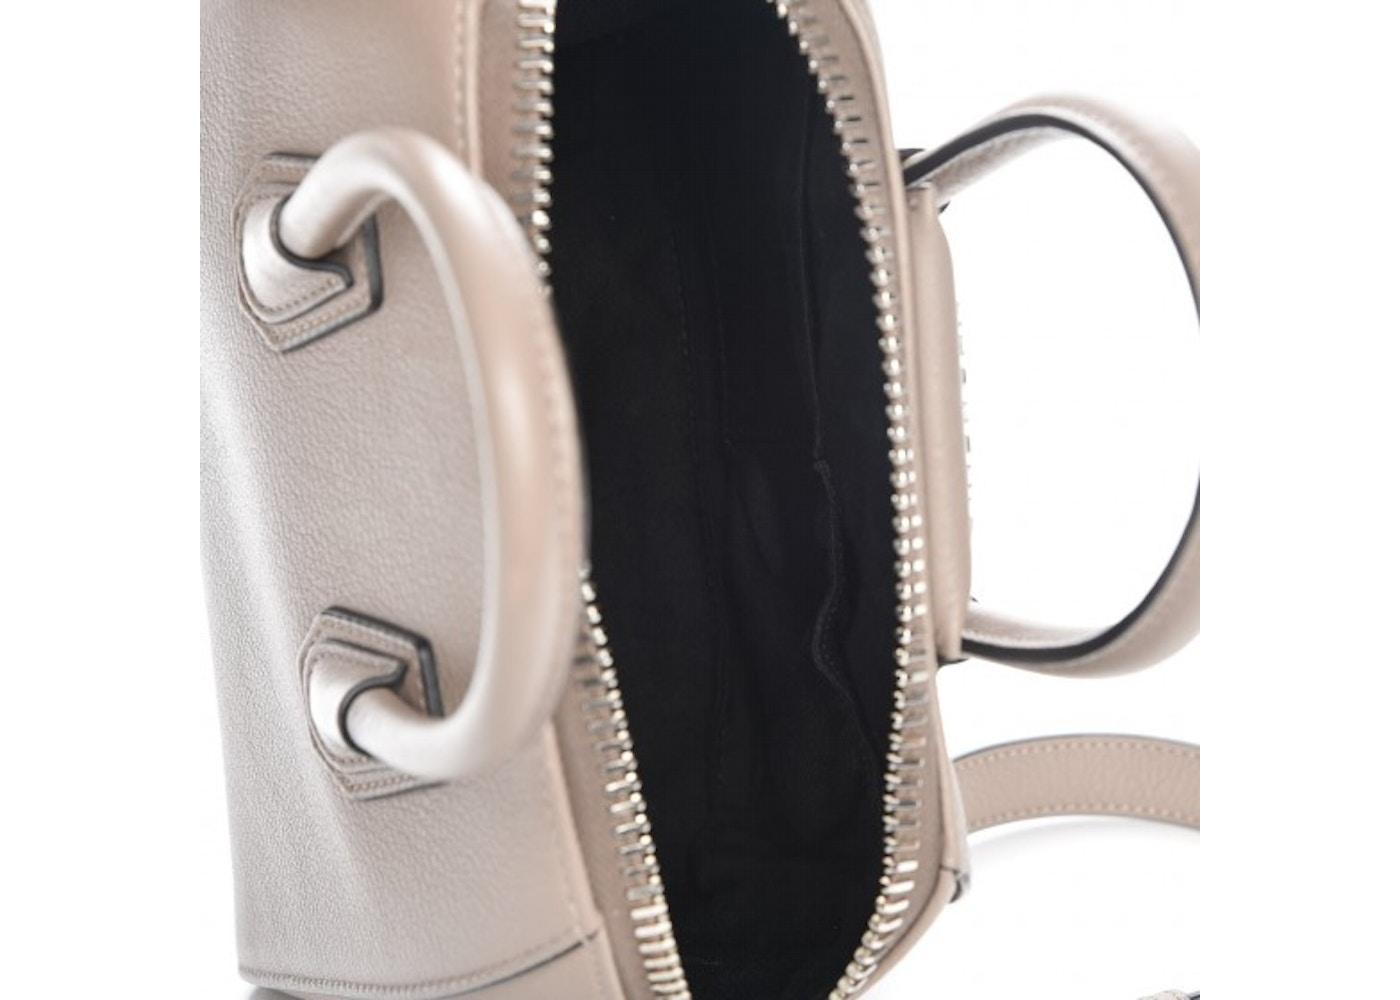 3c3bdf5541e Givenchy Antigona Tote Sugar Goatskin Mini Mastic